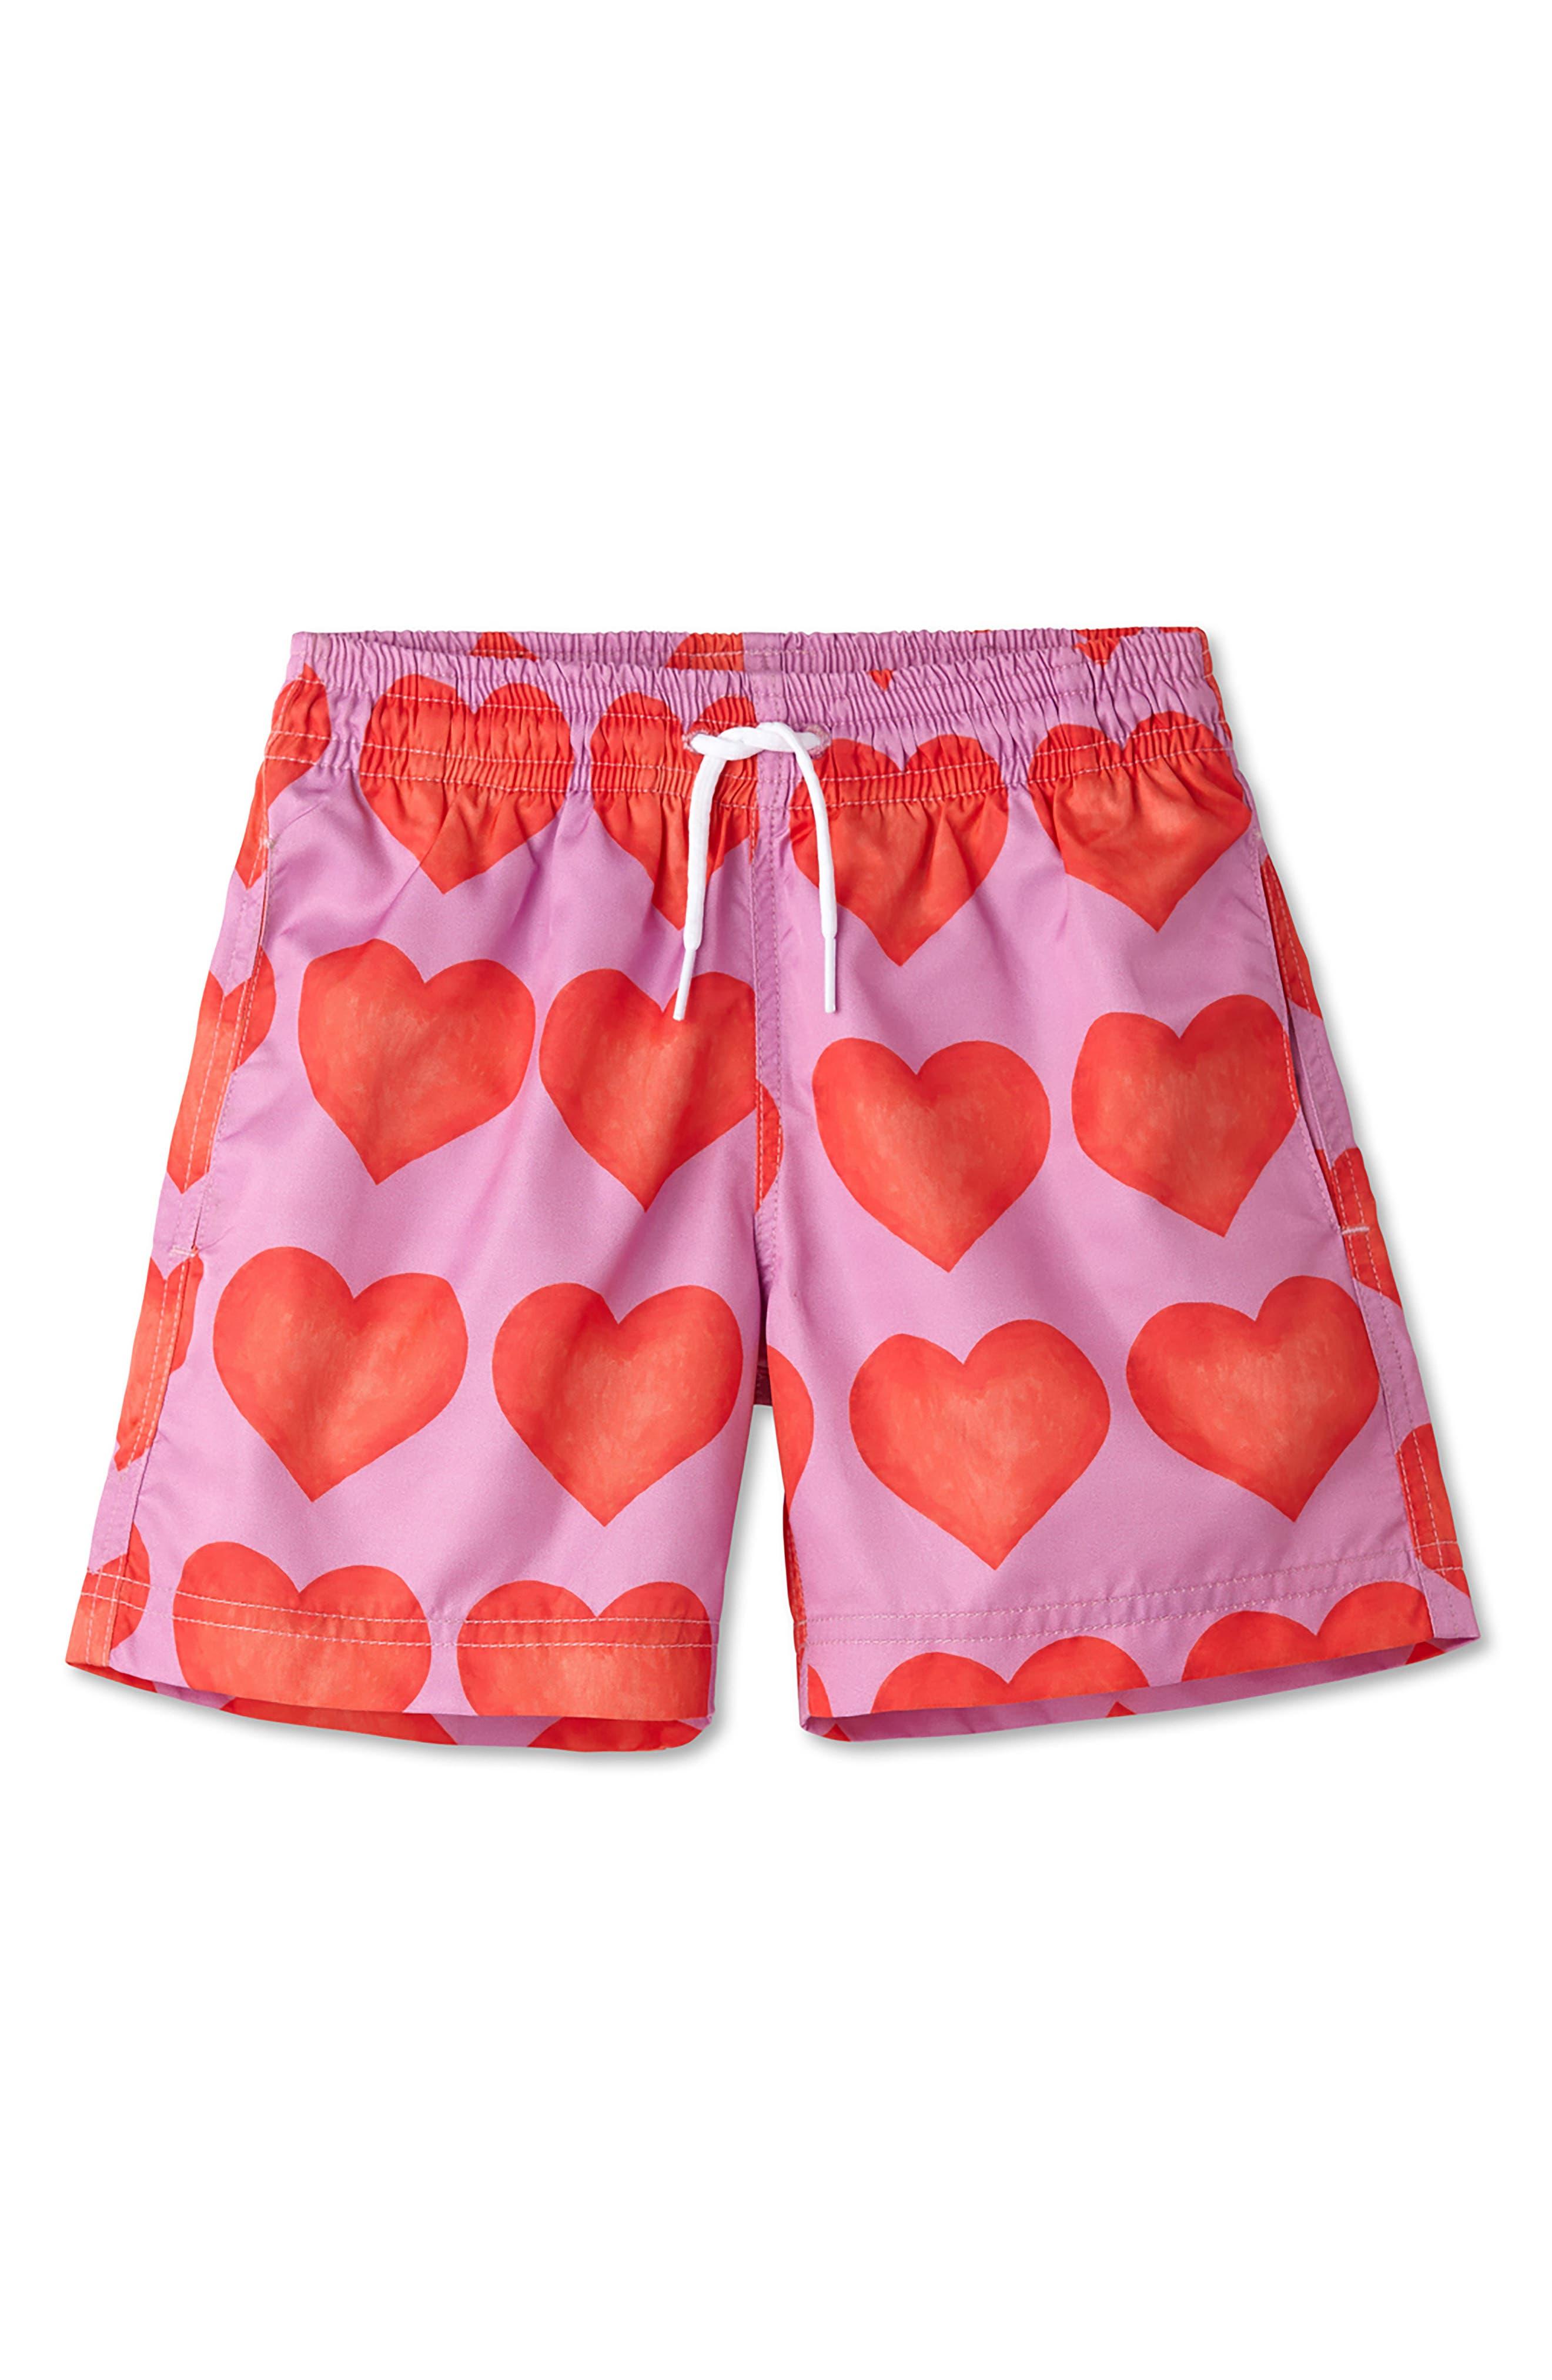 Heart Print Swim Trunks,                         Main,                         color,